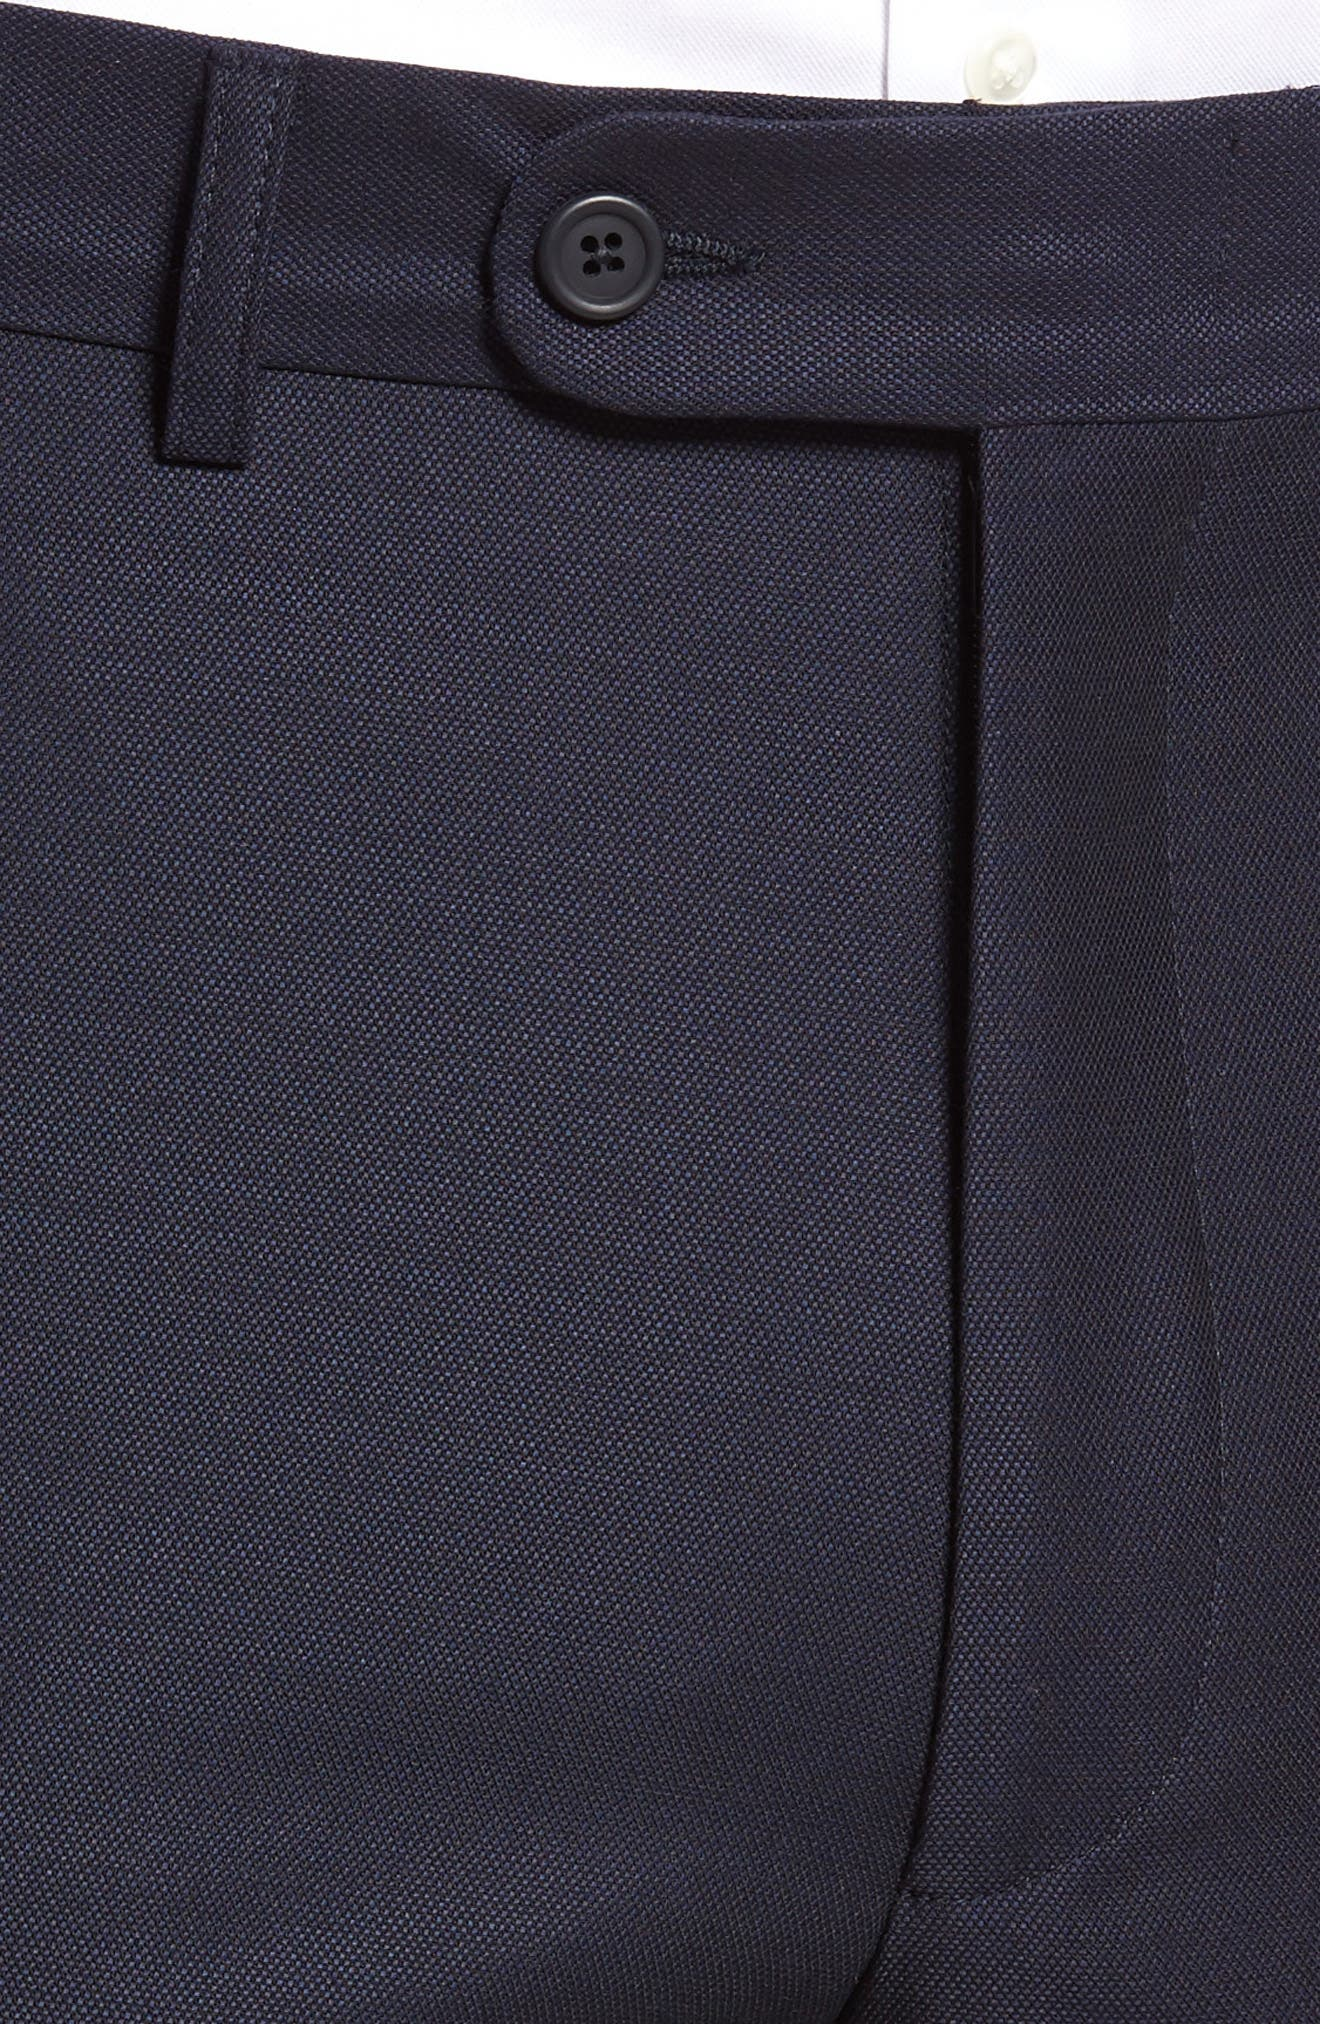 Pin Dot Wool Trousers,                             Alternate thumbnail 10, color,